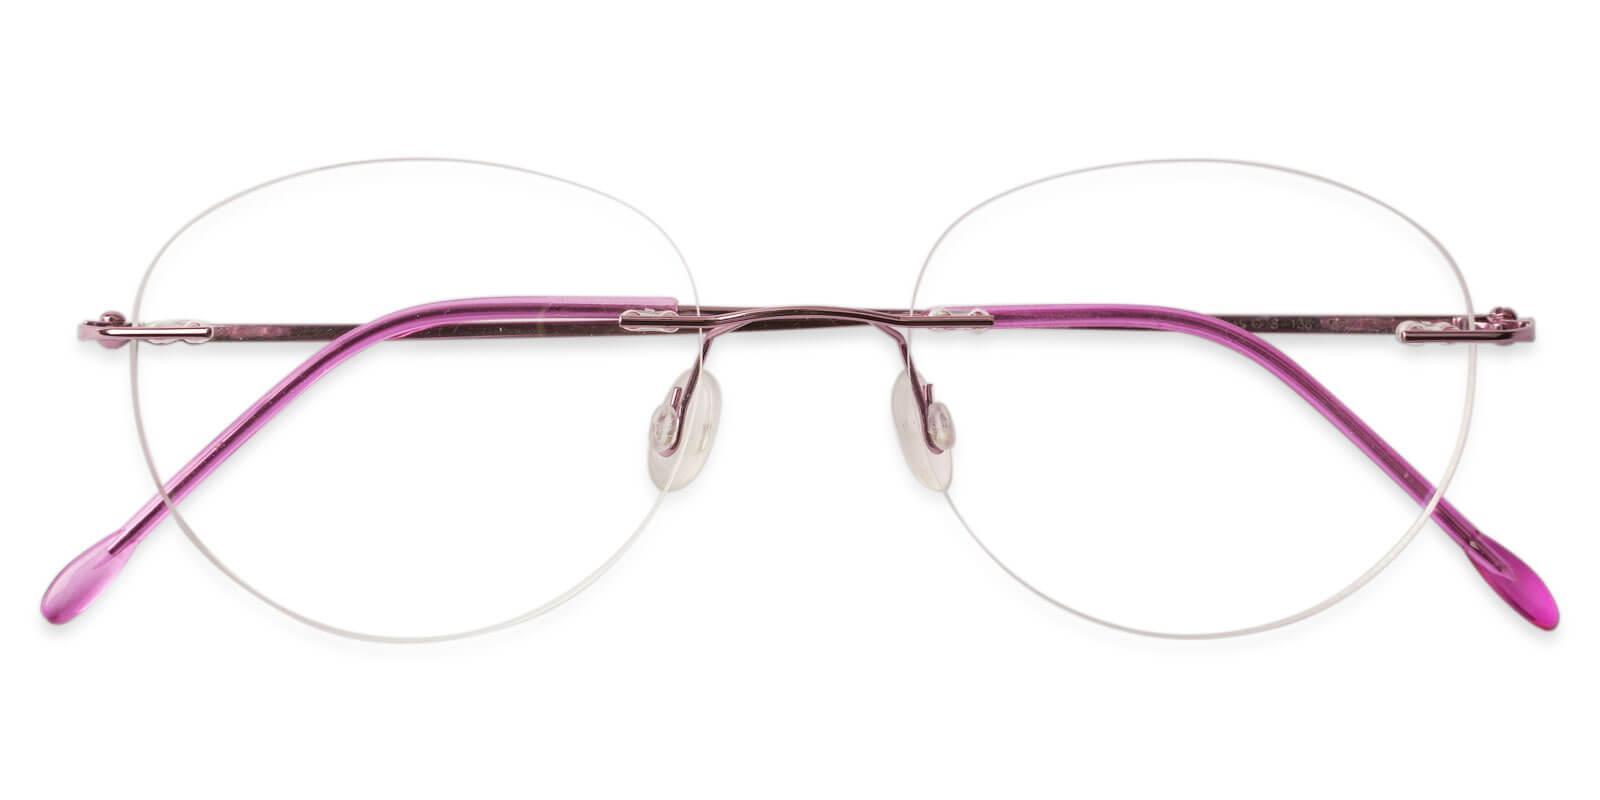 Terrace Park Pink Metal Eyeglasses , NosePads Frames from ABBE Glasses